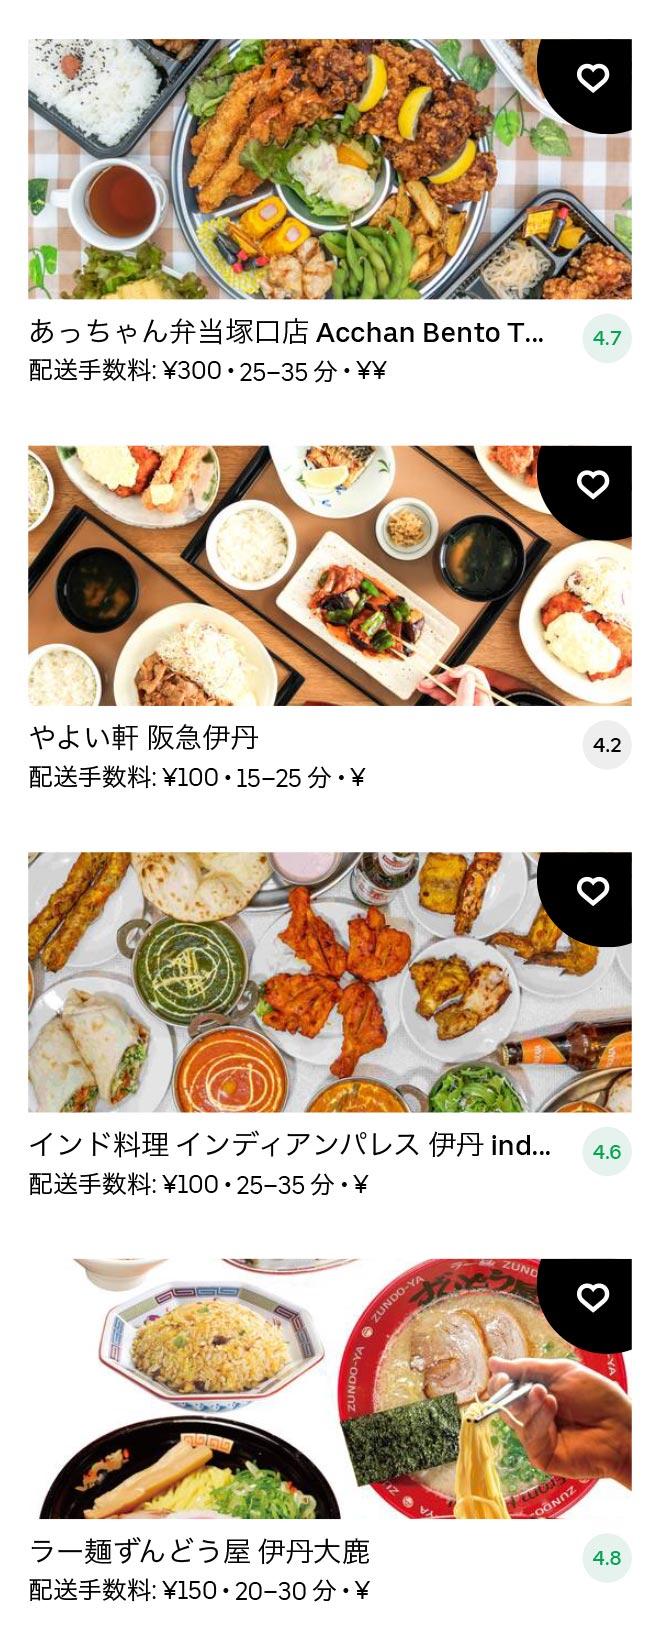 Hankyu itami menu 2011 07